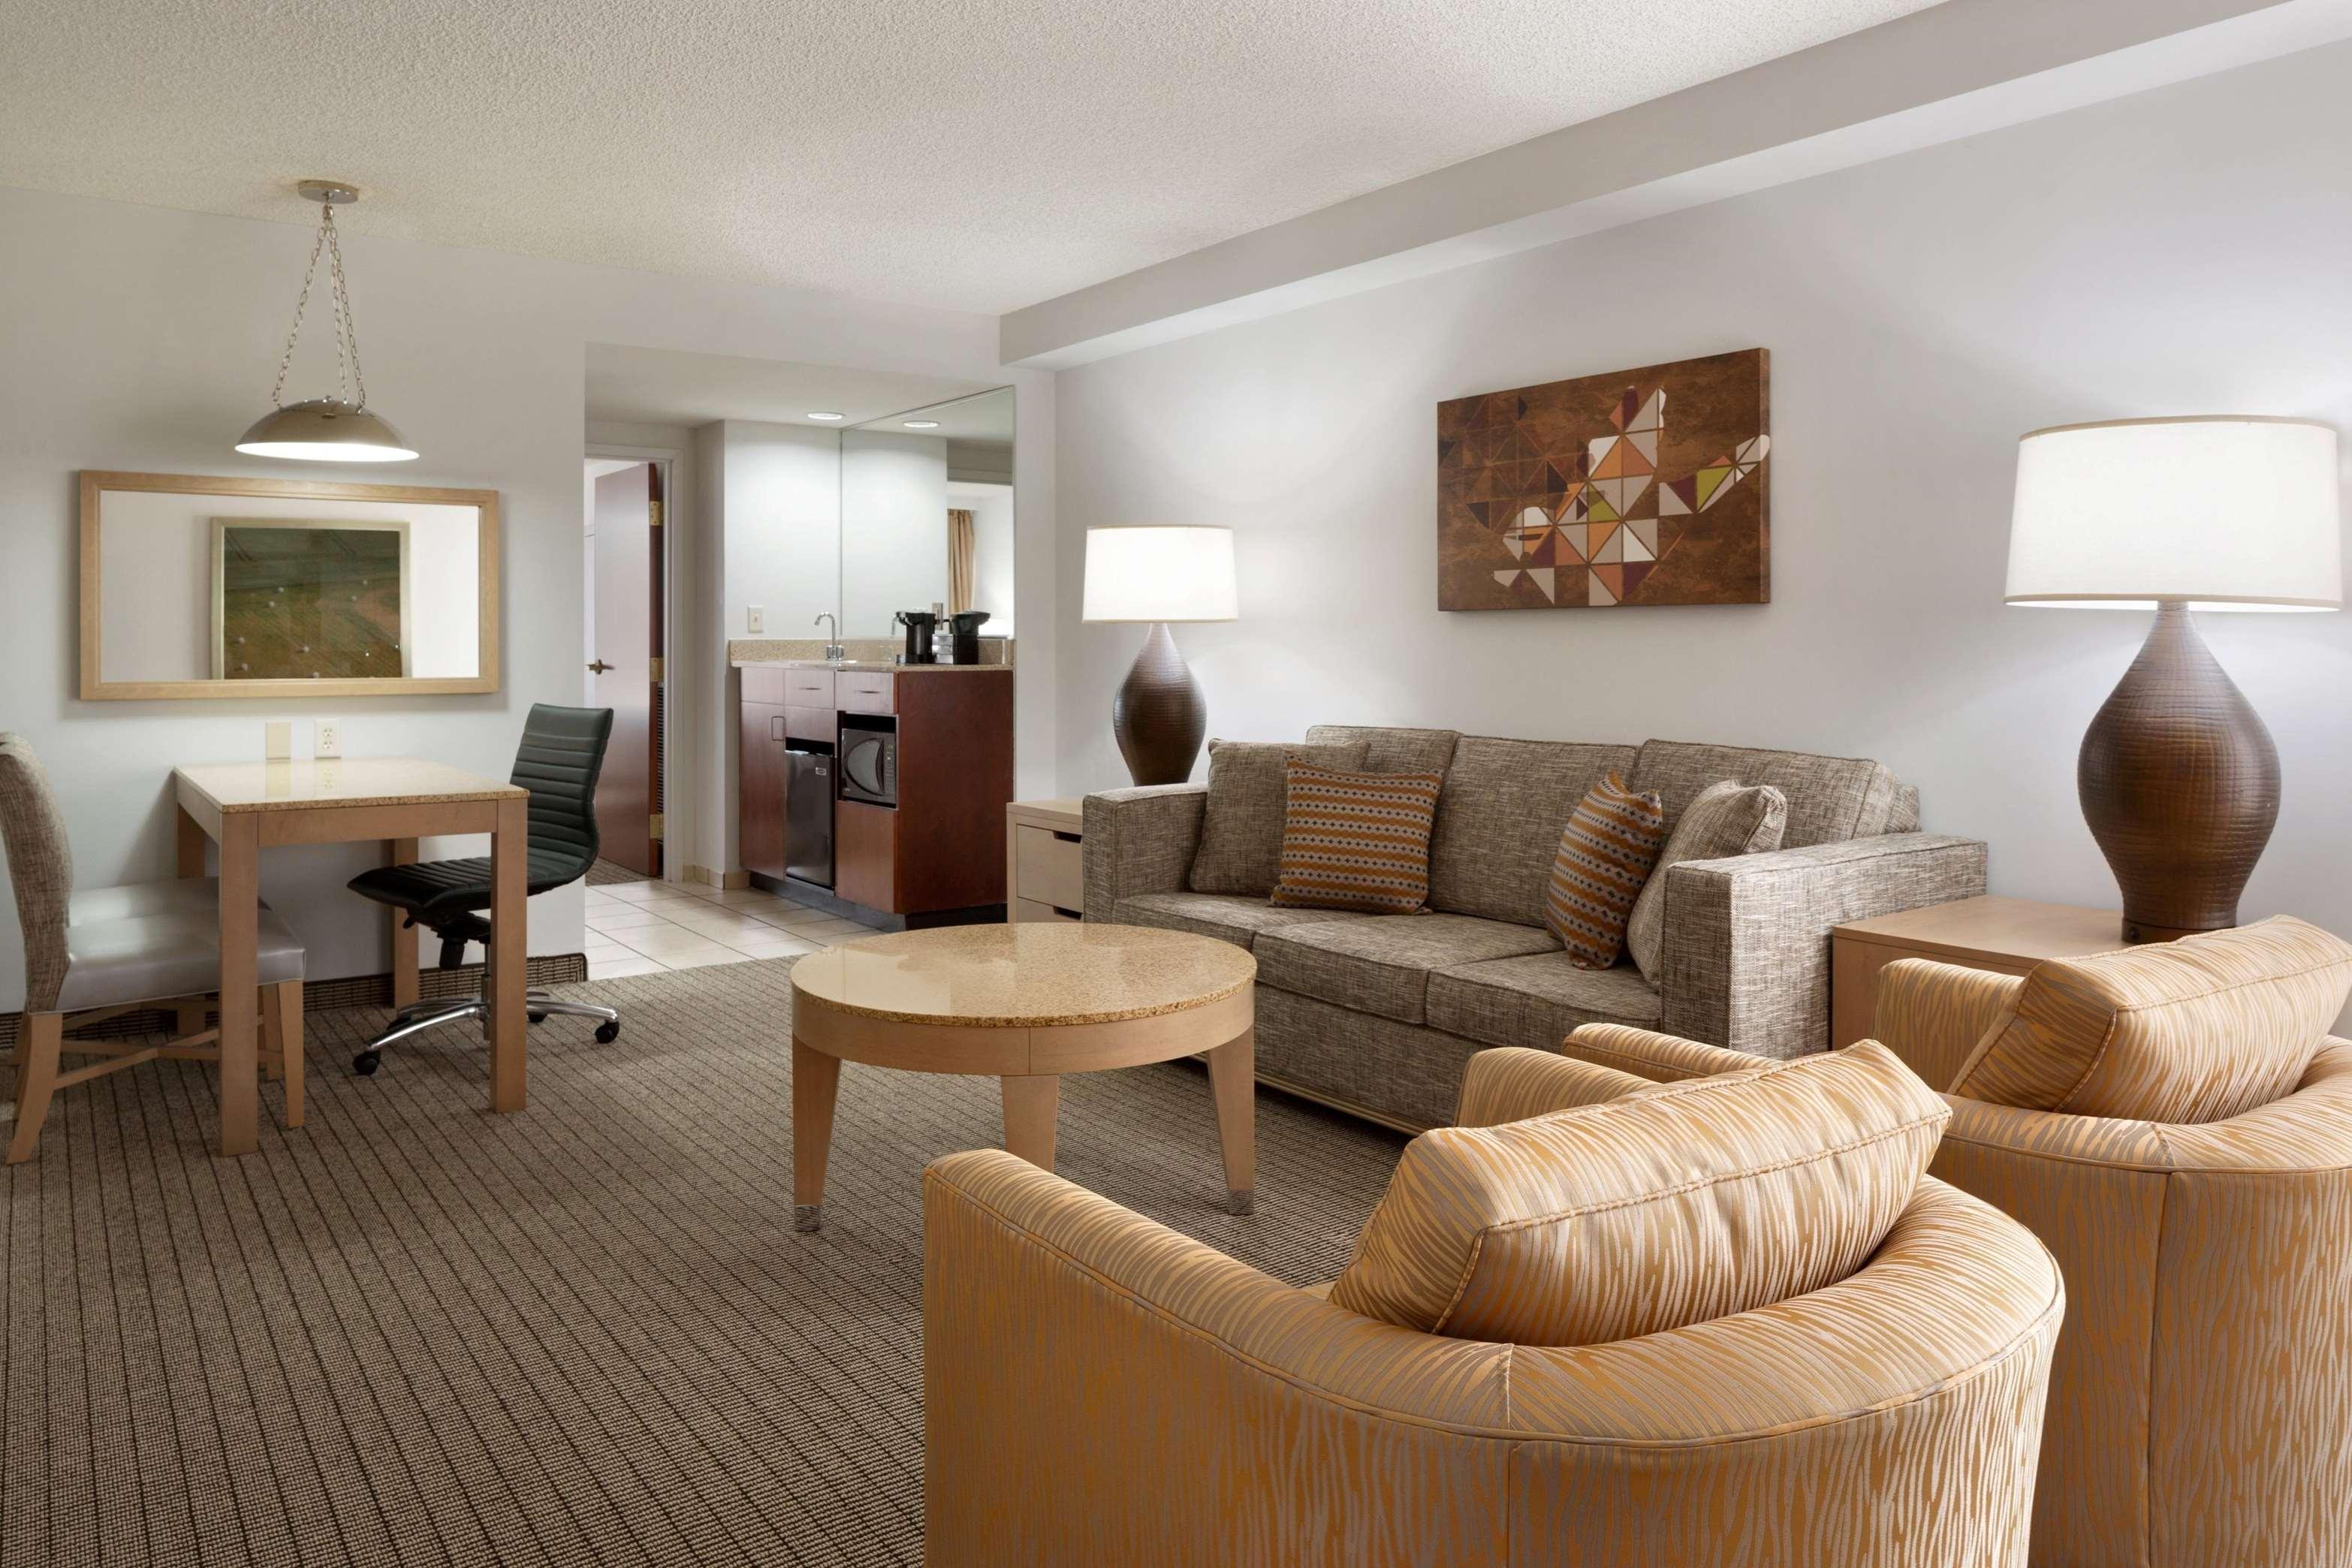 Embassy Suites by Hilton Denver International Airport image 23